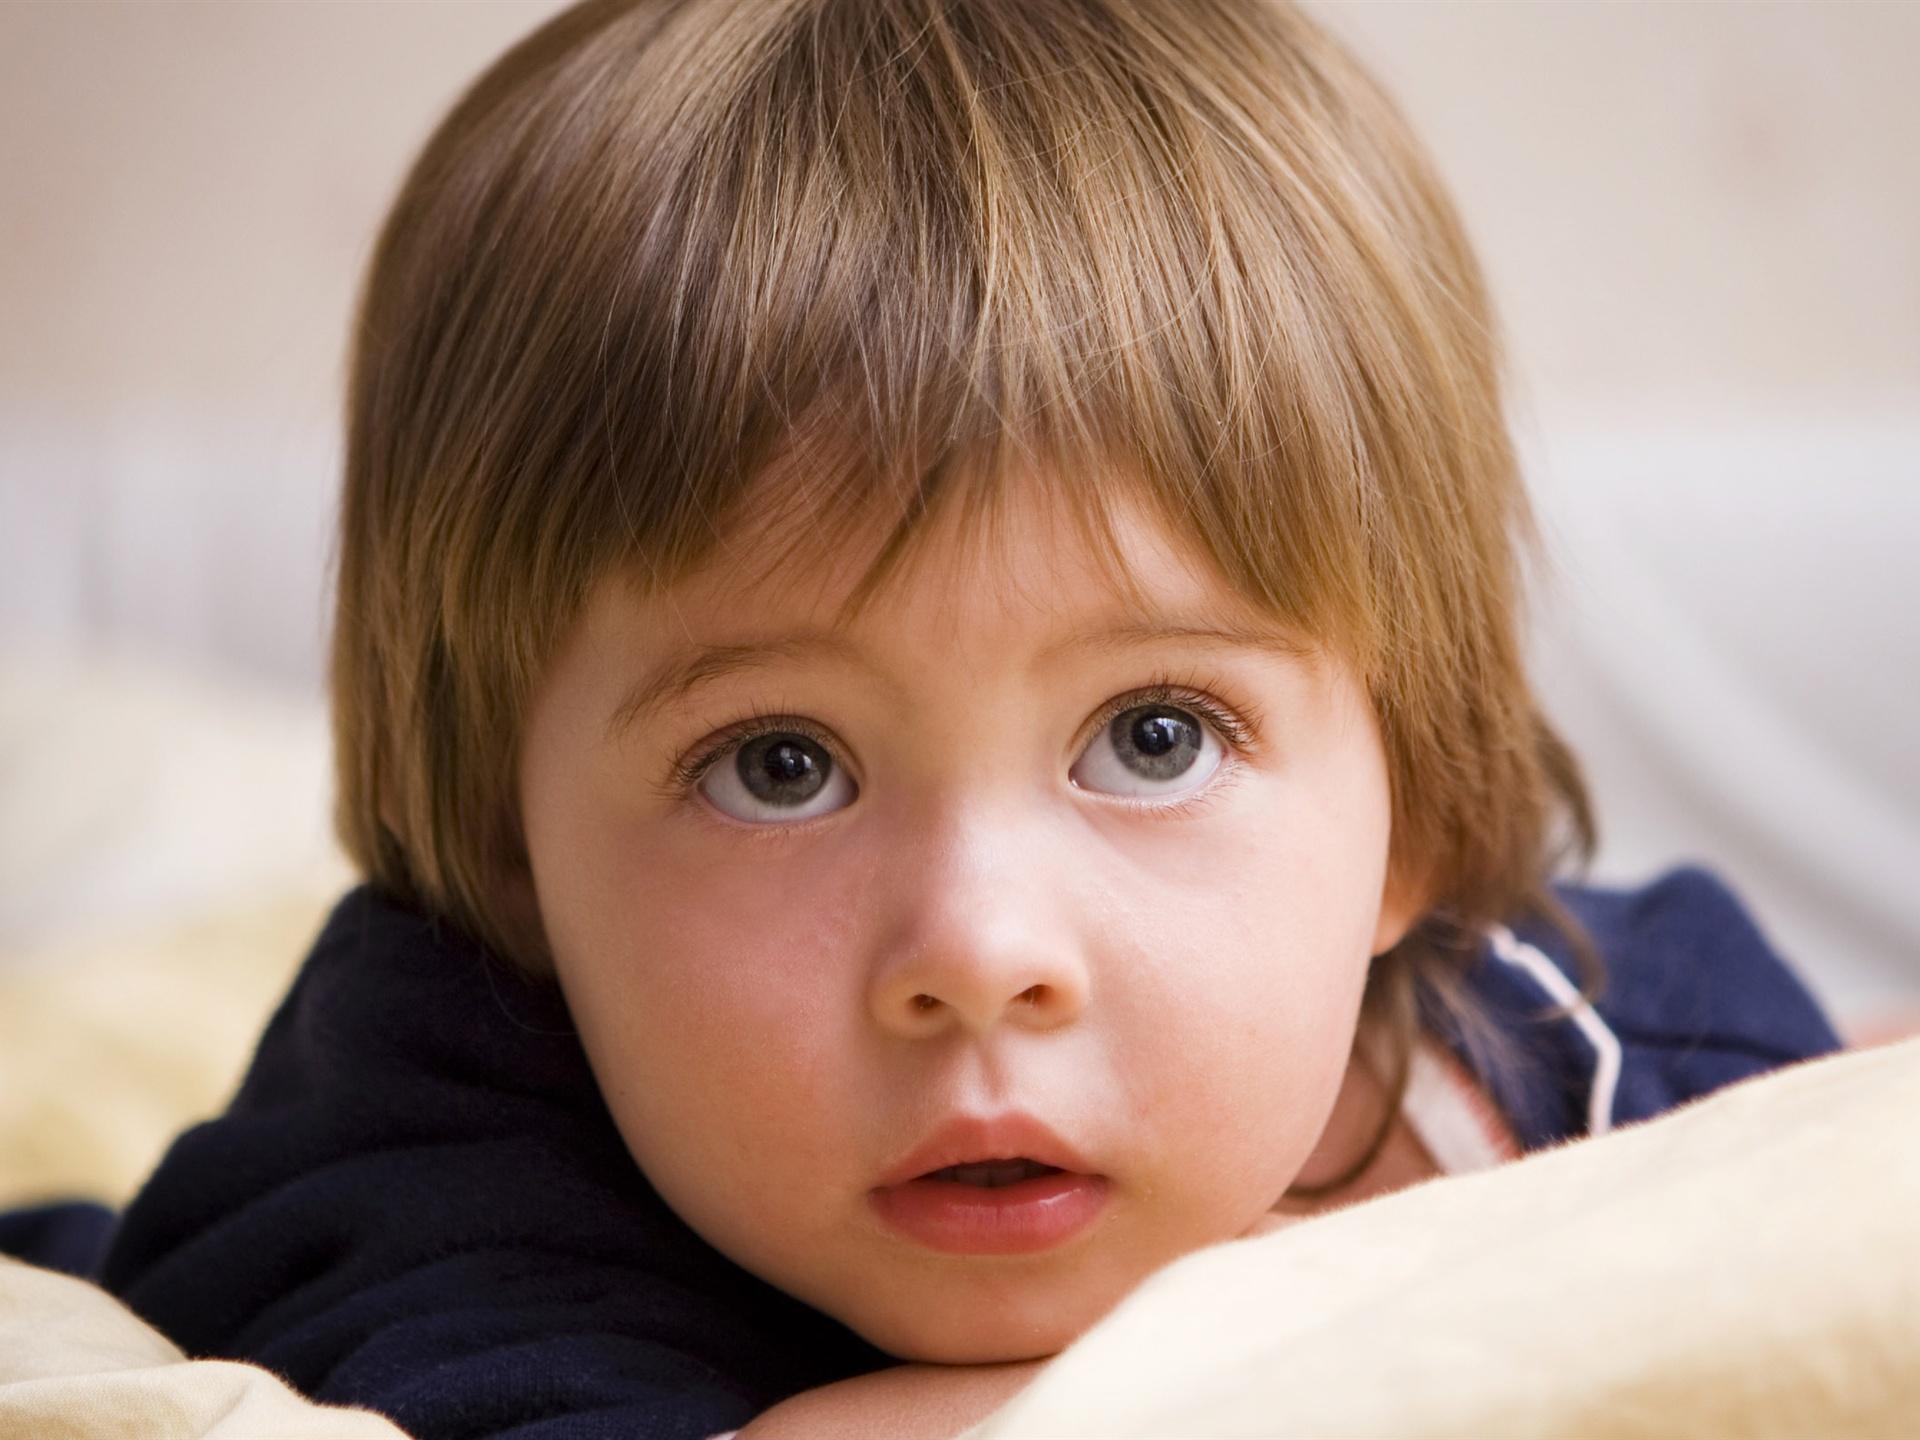 cute little boy wallpaper 1920x1440 wallpaper download cute little boy